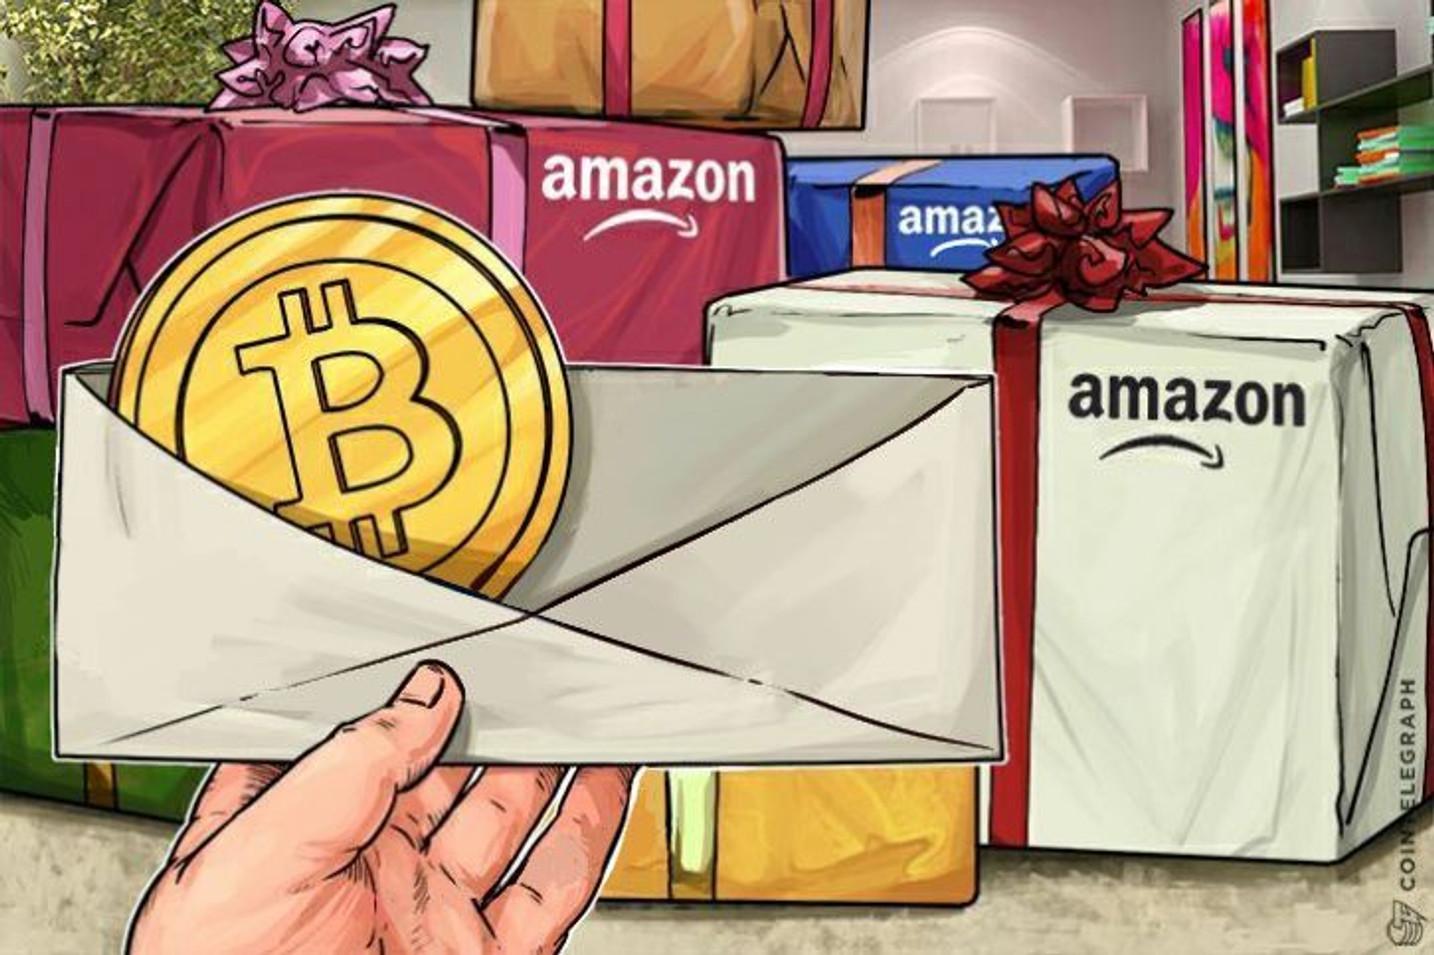 「Amazonが10月にビットコイン決済を導入するかもしれない」という確証のない噂が出回る